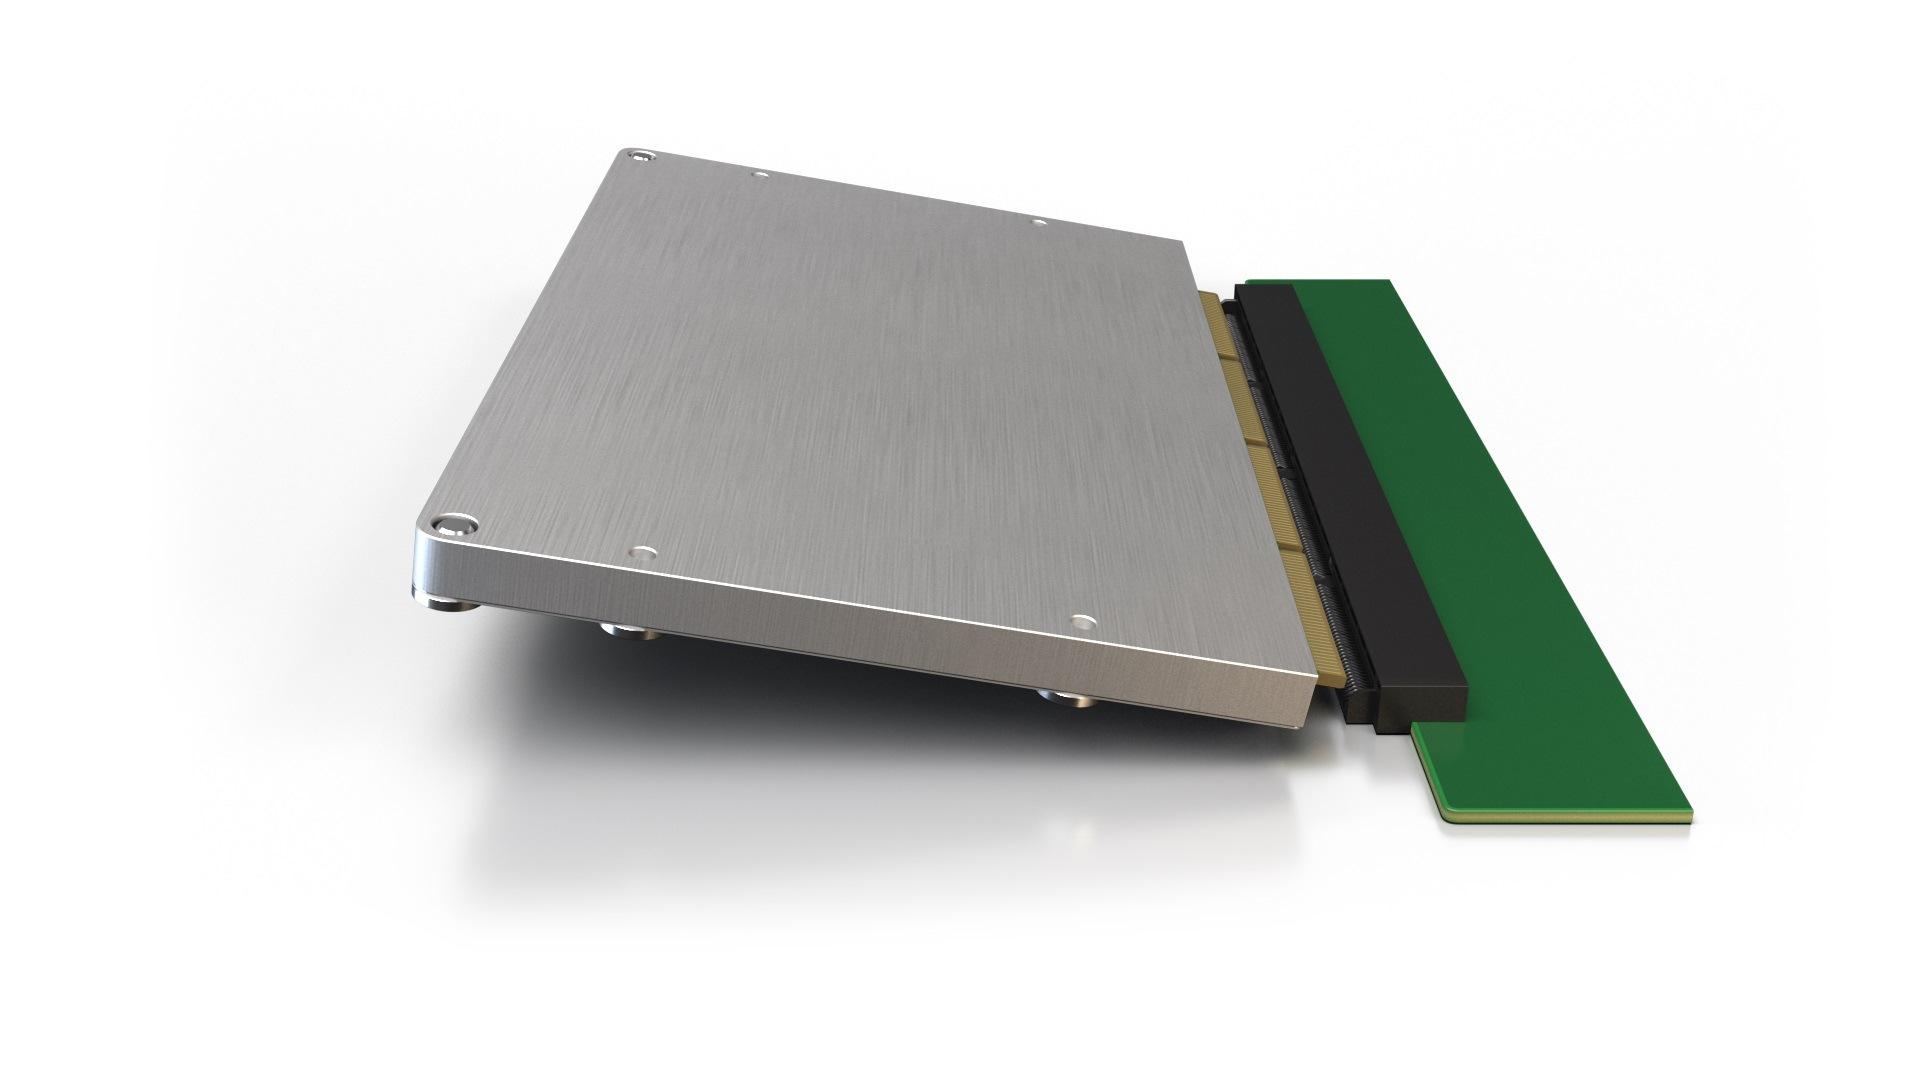 Intel-NUC-Compute-Element-2